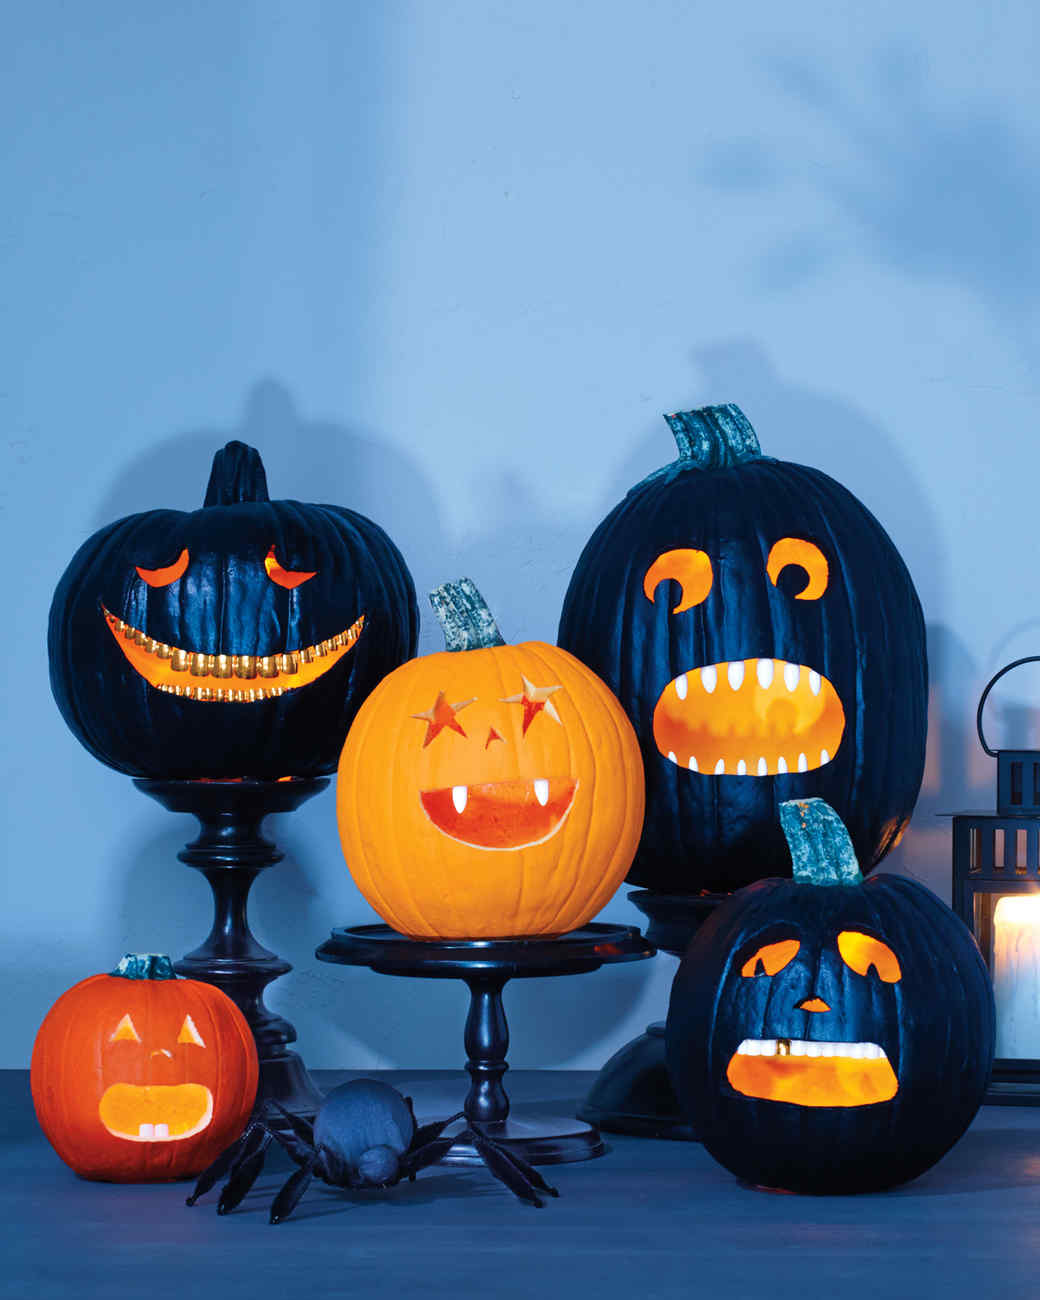 acrylic-nail-pumpkins-465-d112253.jpg